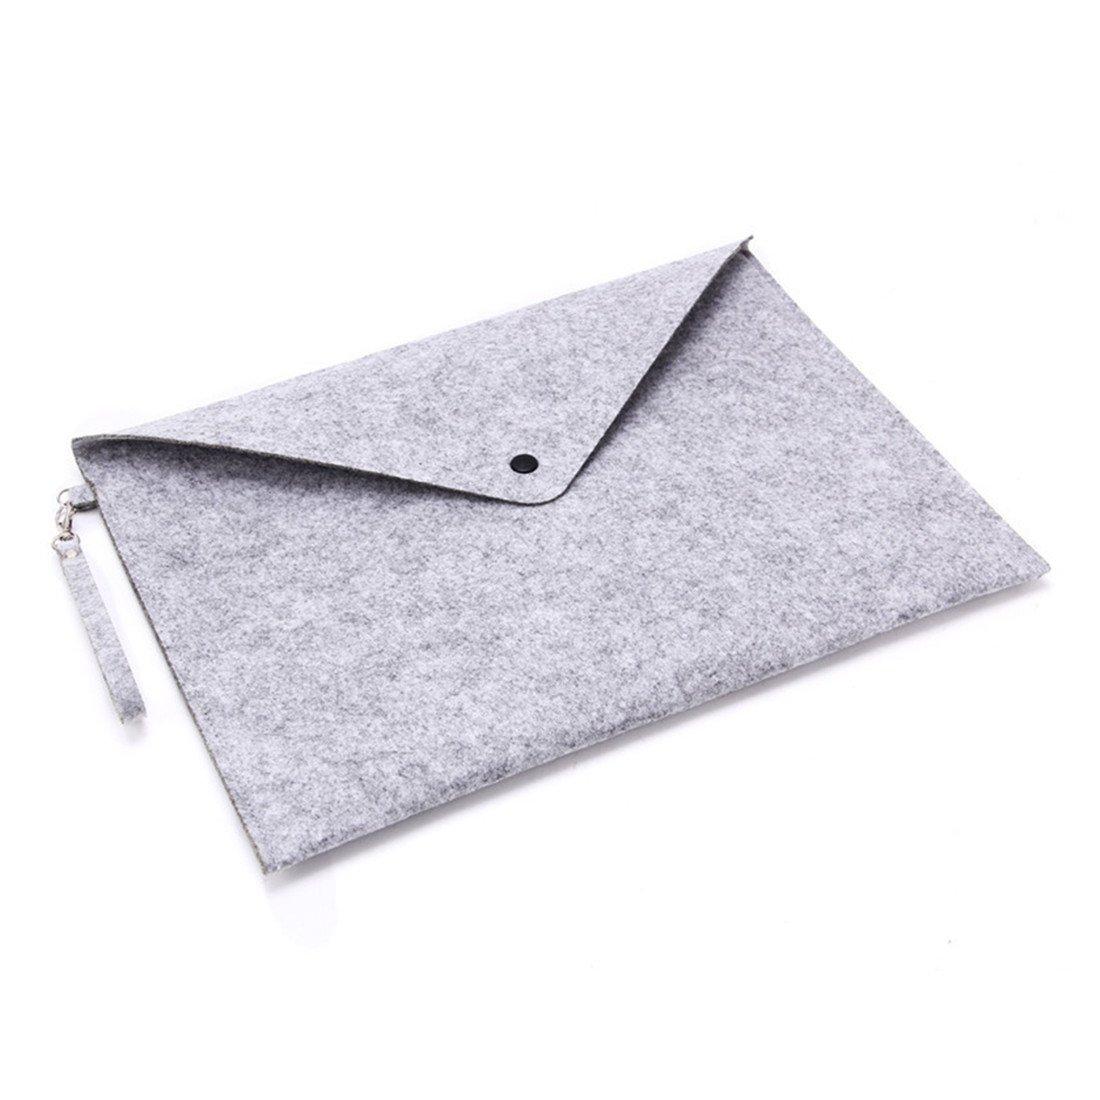 carpeta de documentos de lujo y duradera formato A4 Carpeta archivadora port/átil de fieltro extensible escuela gris claro organizador HOBOYER bolsa de almacenamiento de papel para oficina